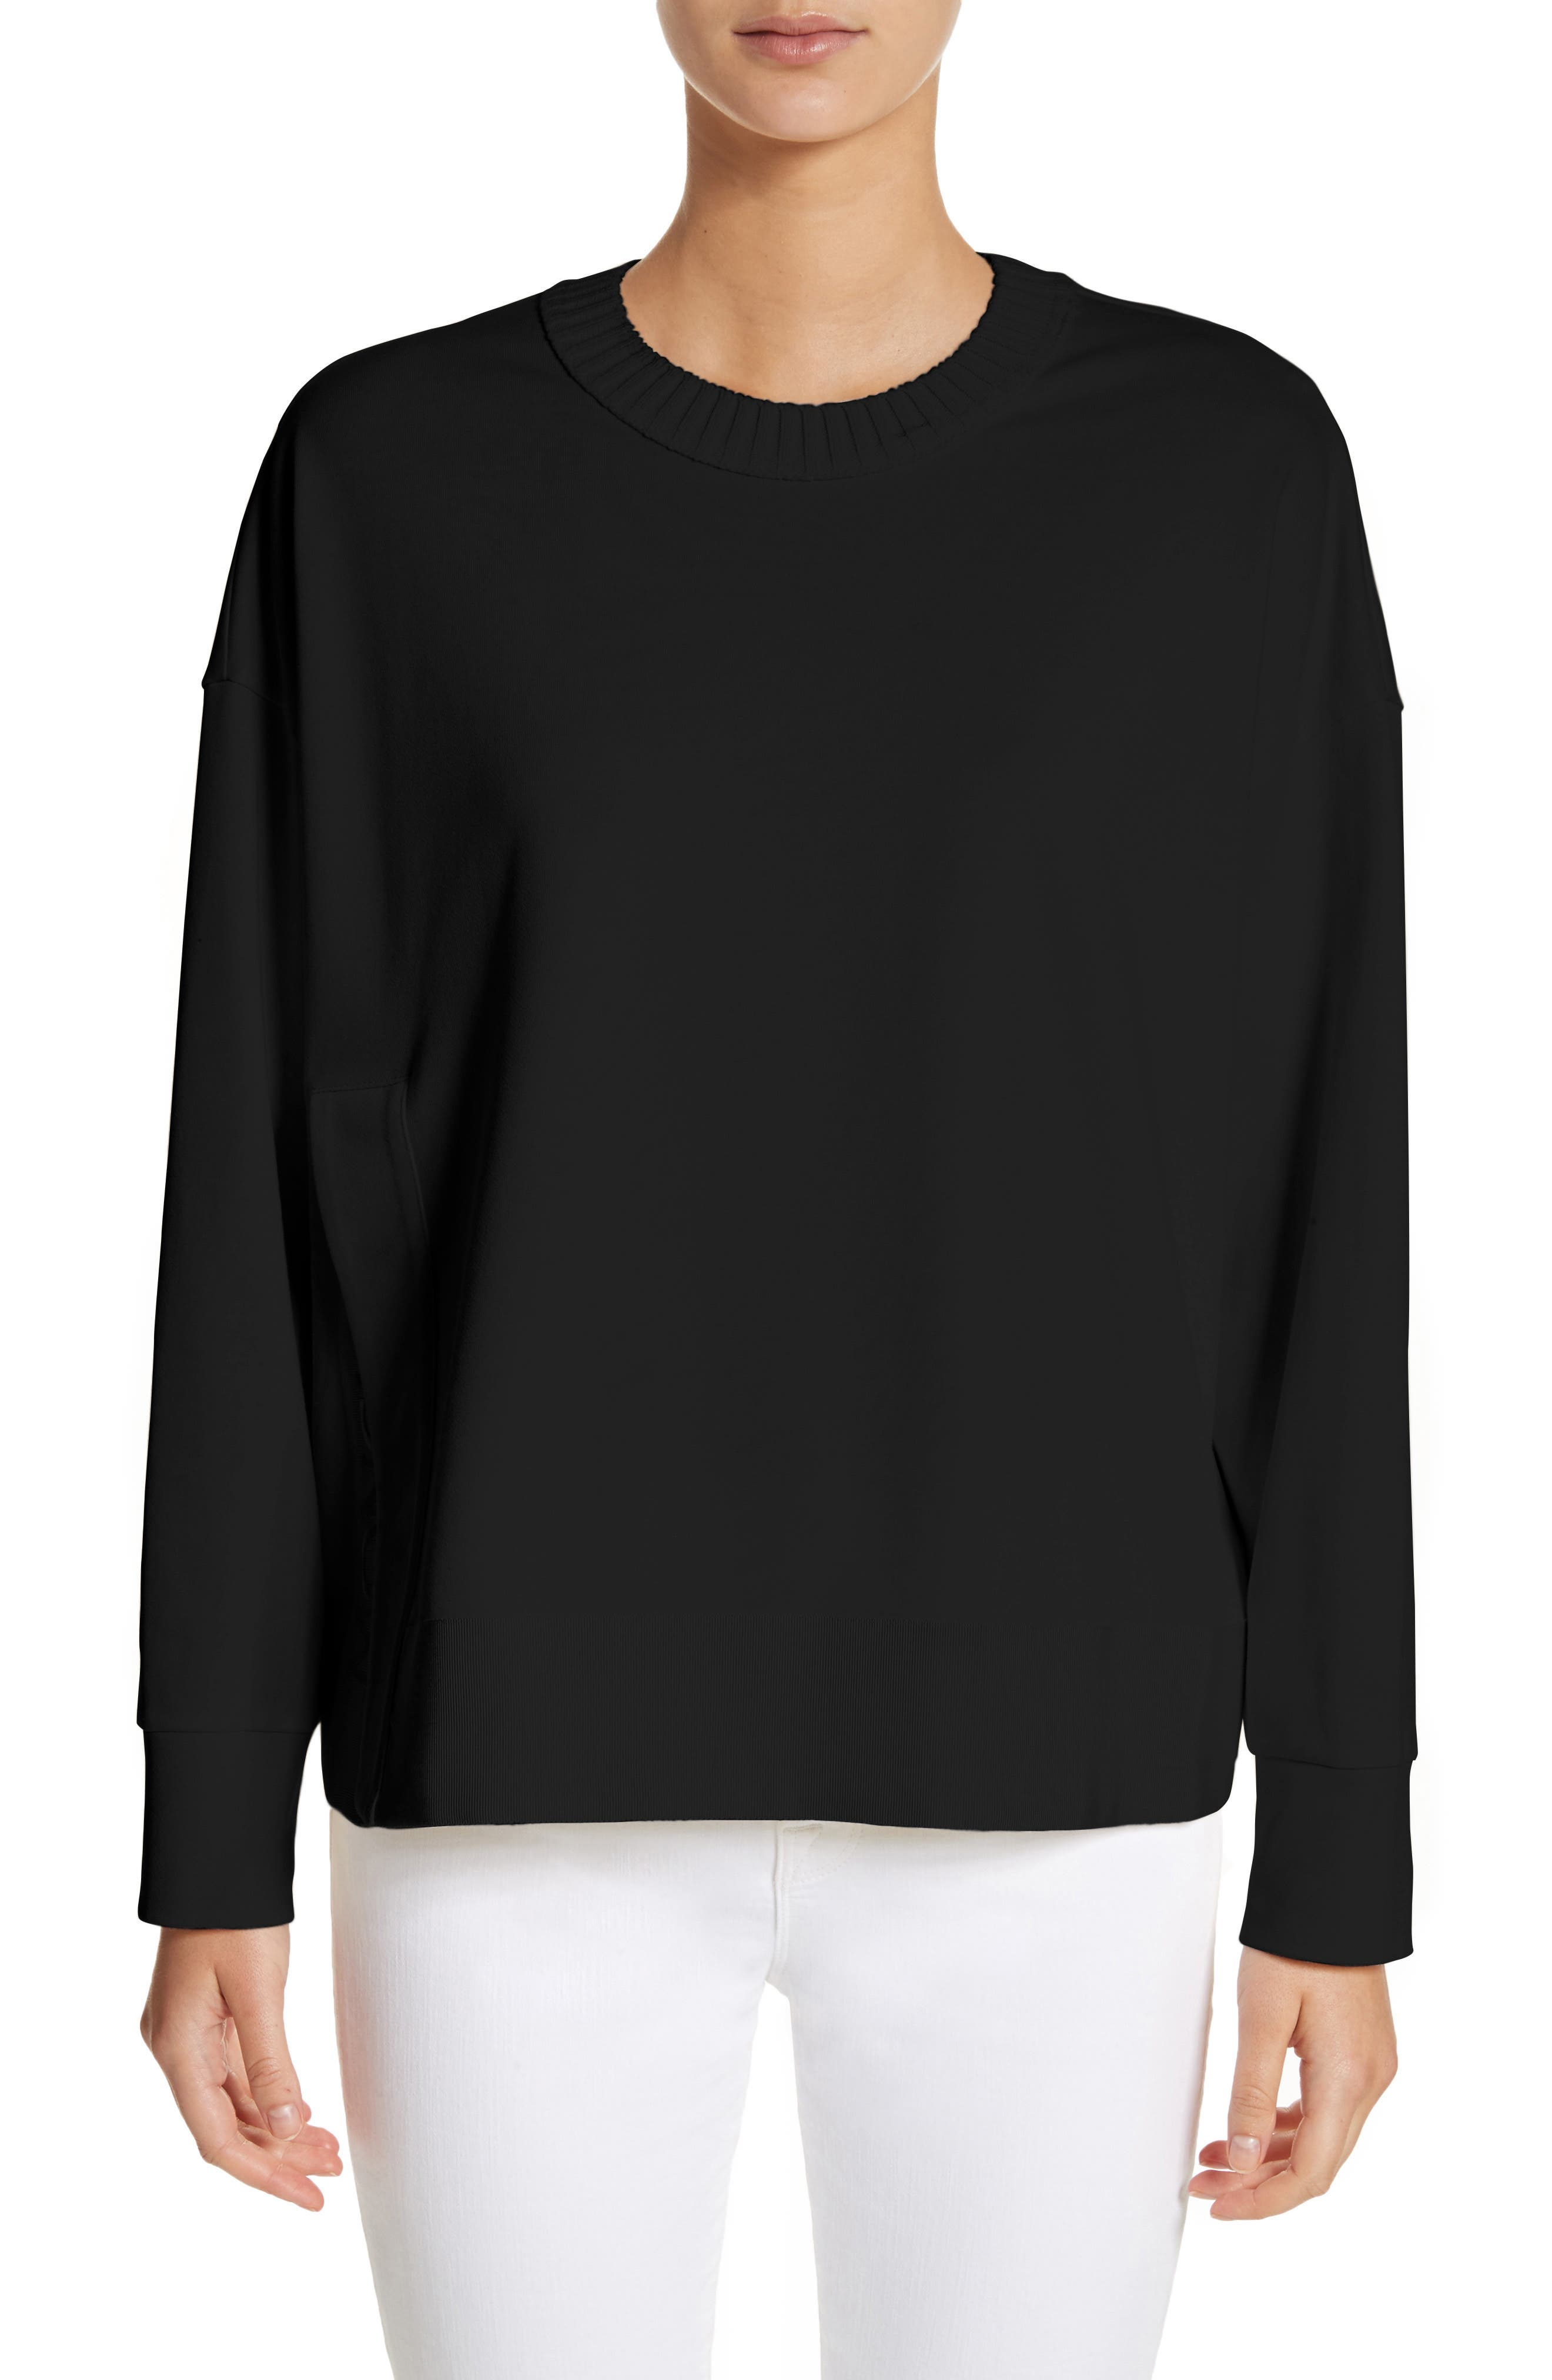 Cotton Sweatshirt,                         Main,                         color, Black